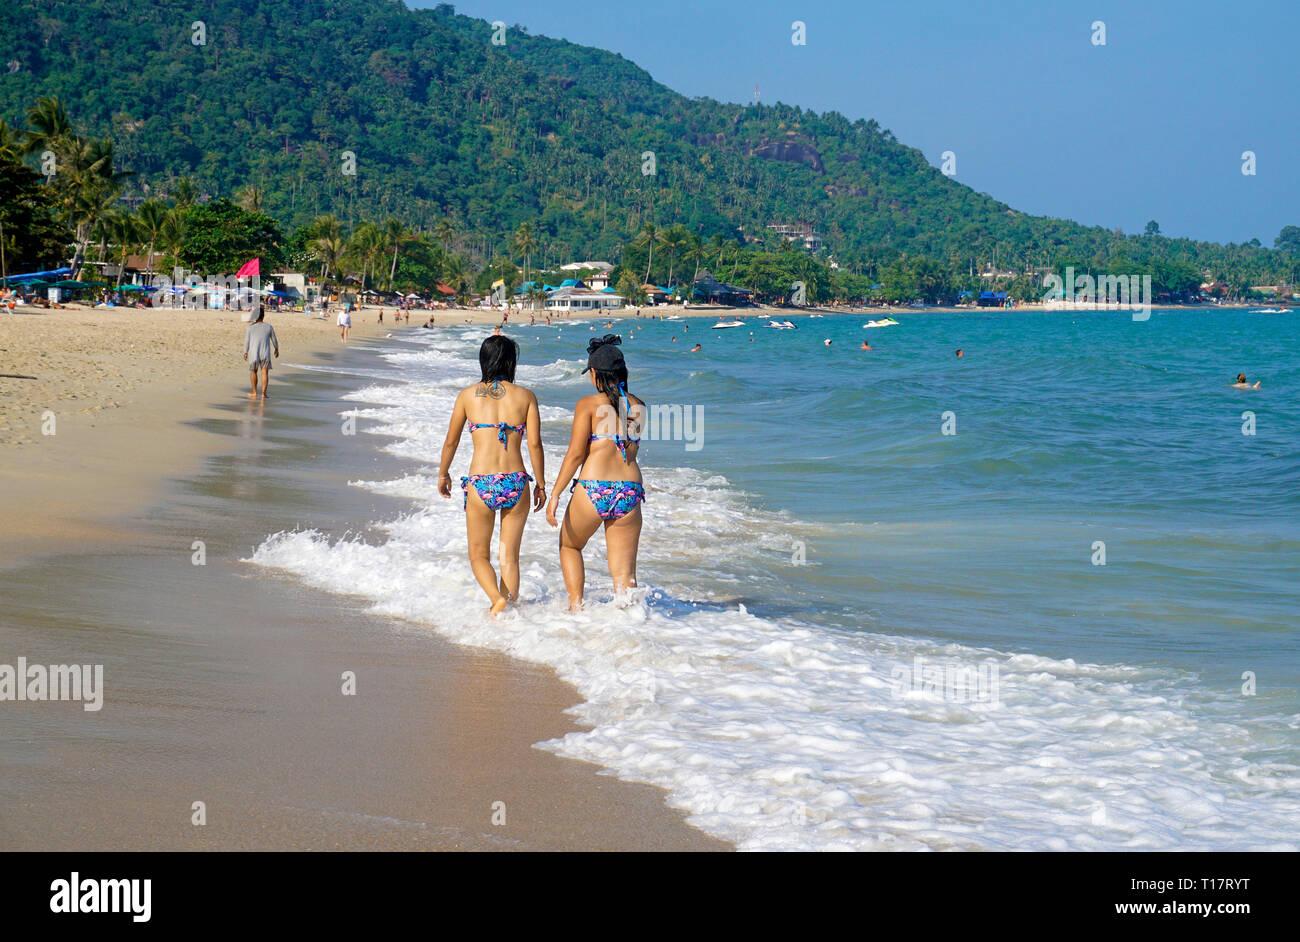 Two girls strolling at Lamai Beach on Koh Samui, Gulf of Thailand, Thailand - Stock Image